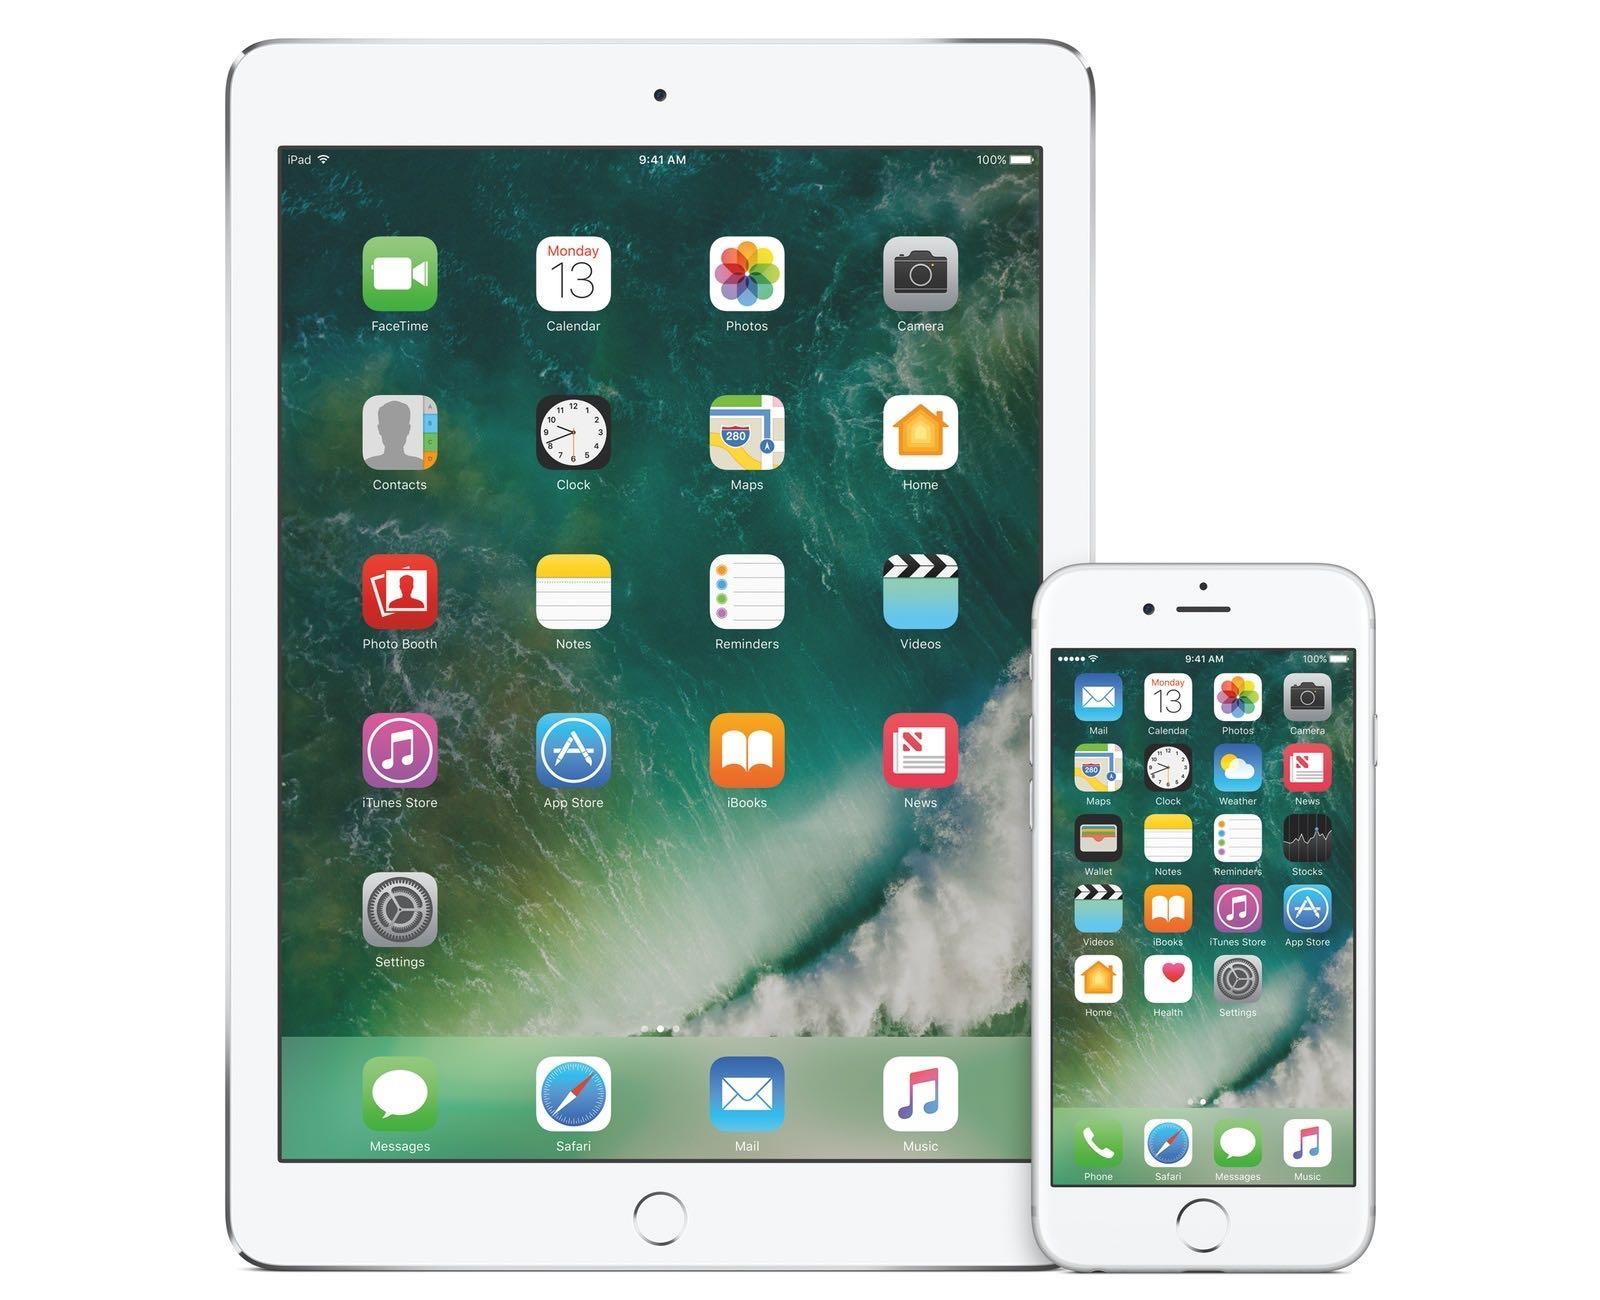 Apple iOS 10.2 download jailbreak install guide